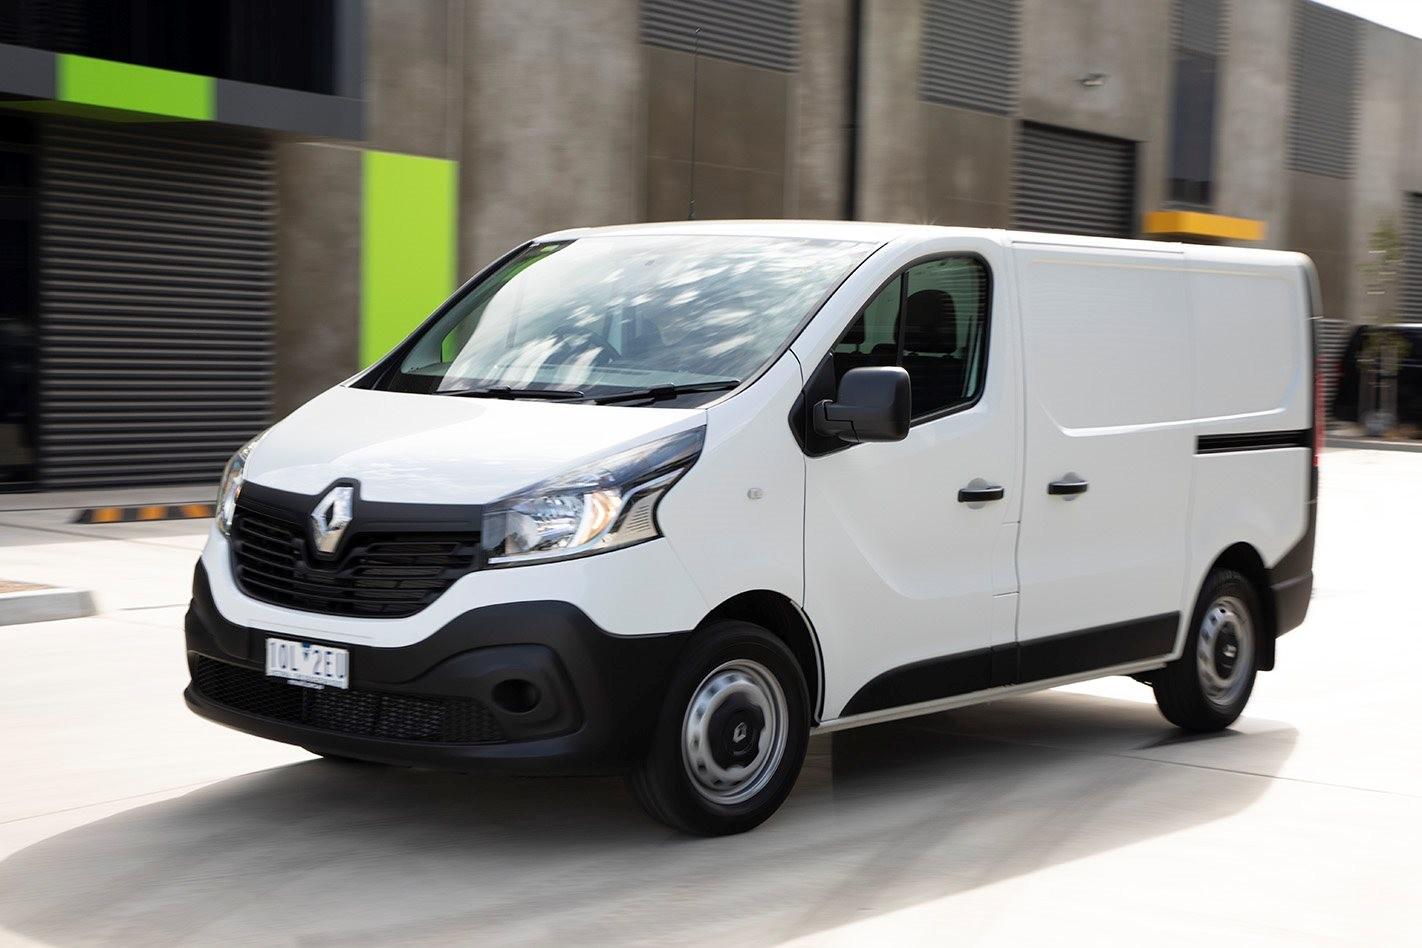 2019 Renault Trafic Traderlife Review Front Side Action Jpg